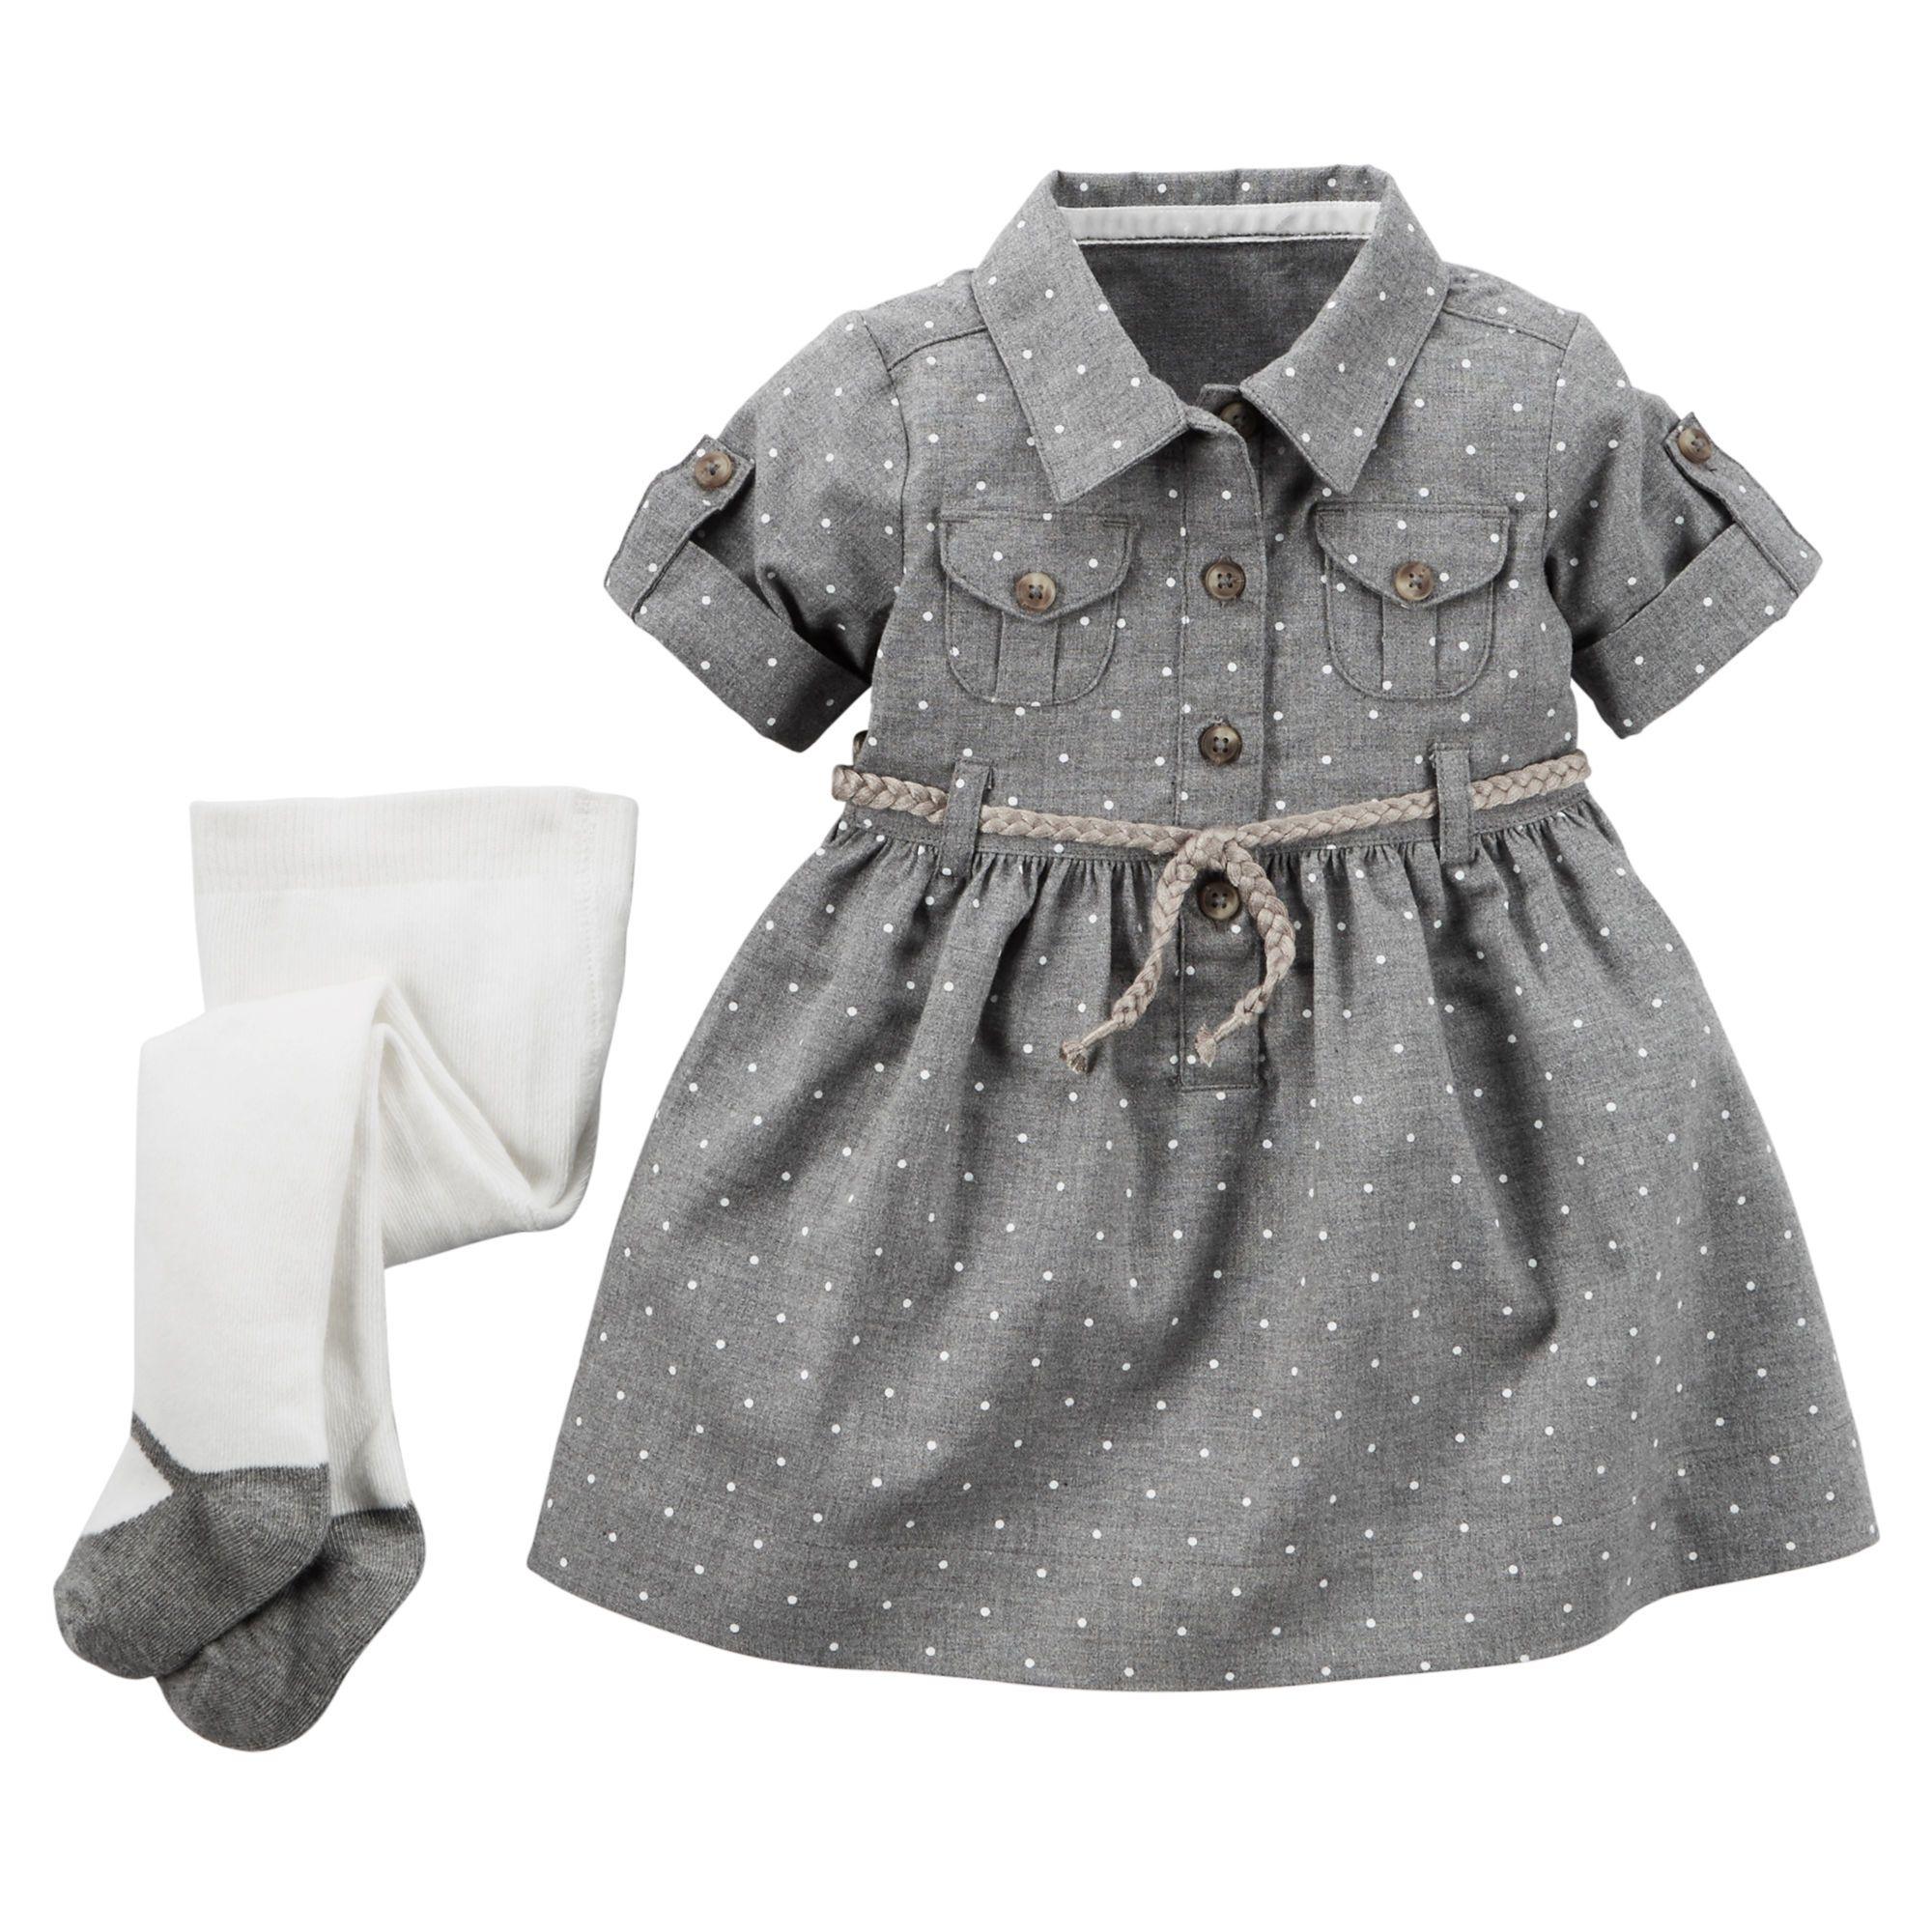 2 Piece Shirt Dress & Tights Set